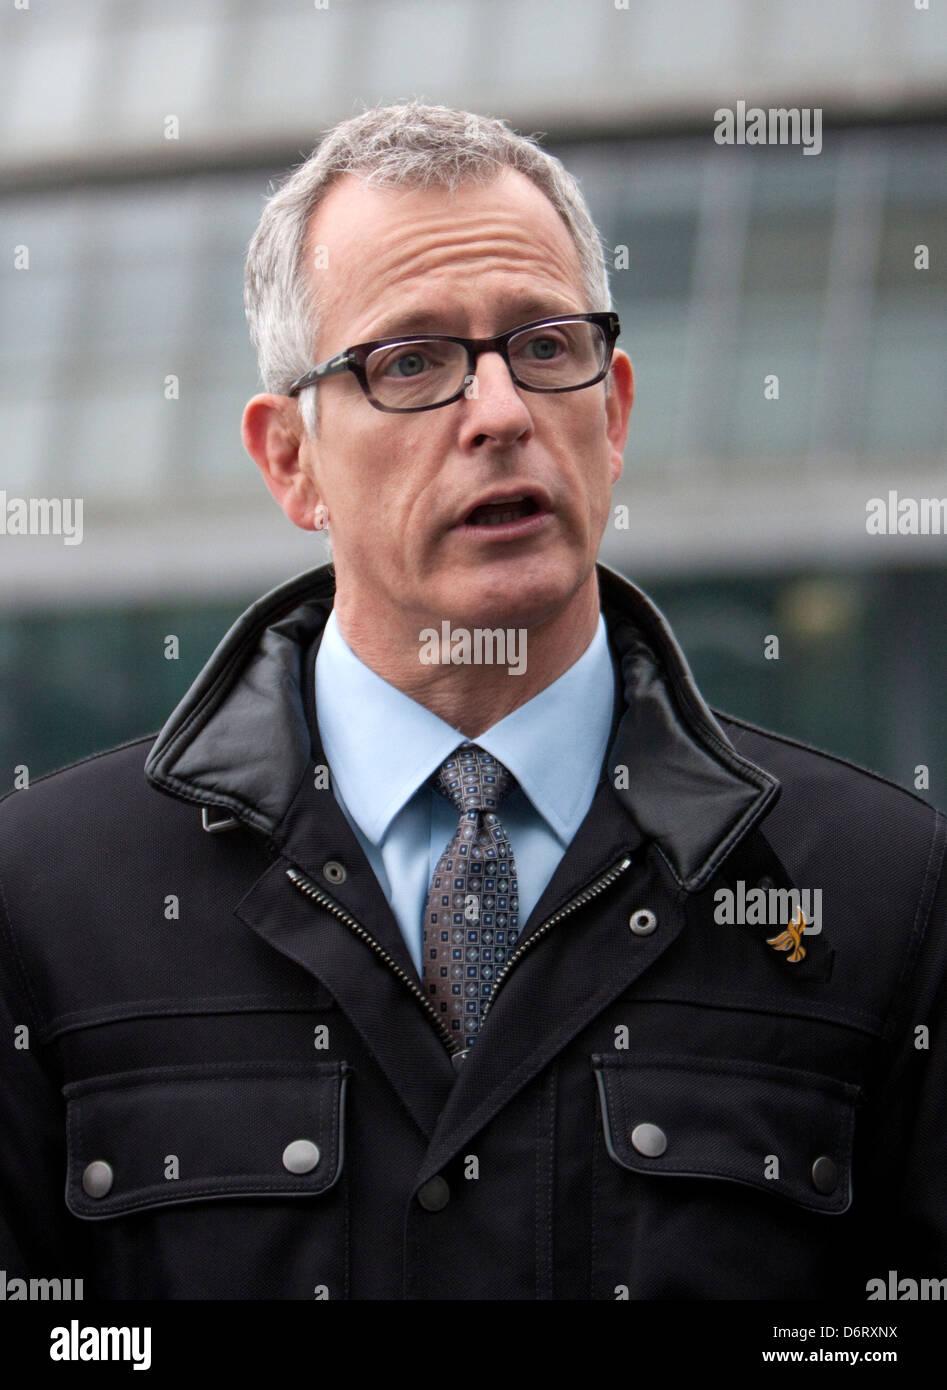 Brian Paddick, Liberal Democrat candidate for London Mayor 05/04/2012, announces duwayne brooks as a deputy - Stock Image